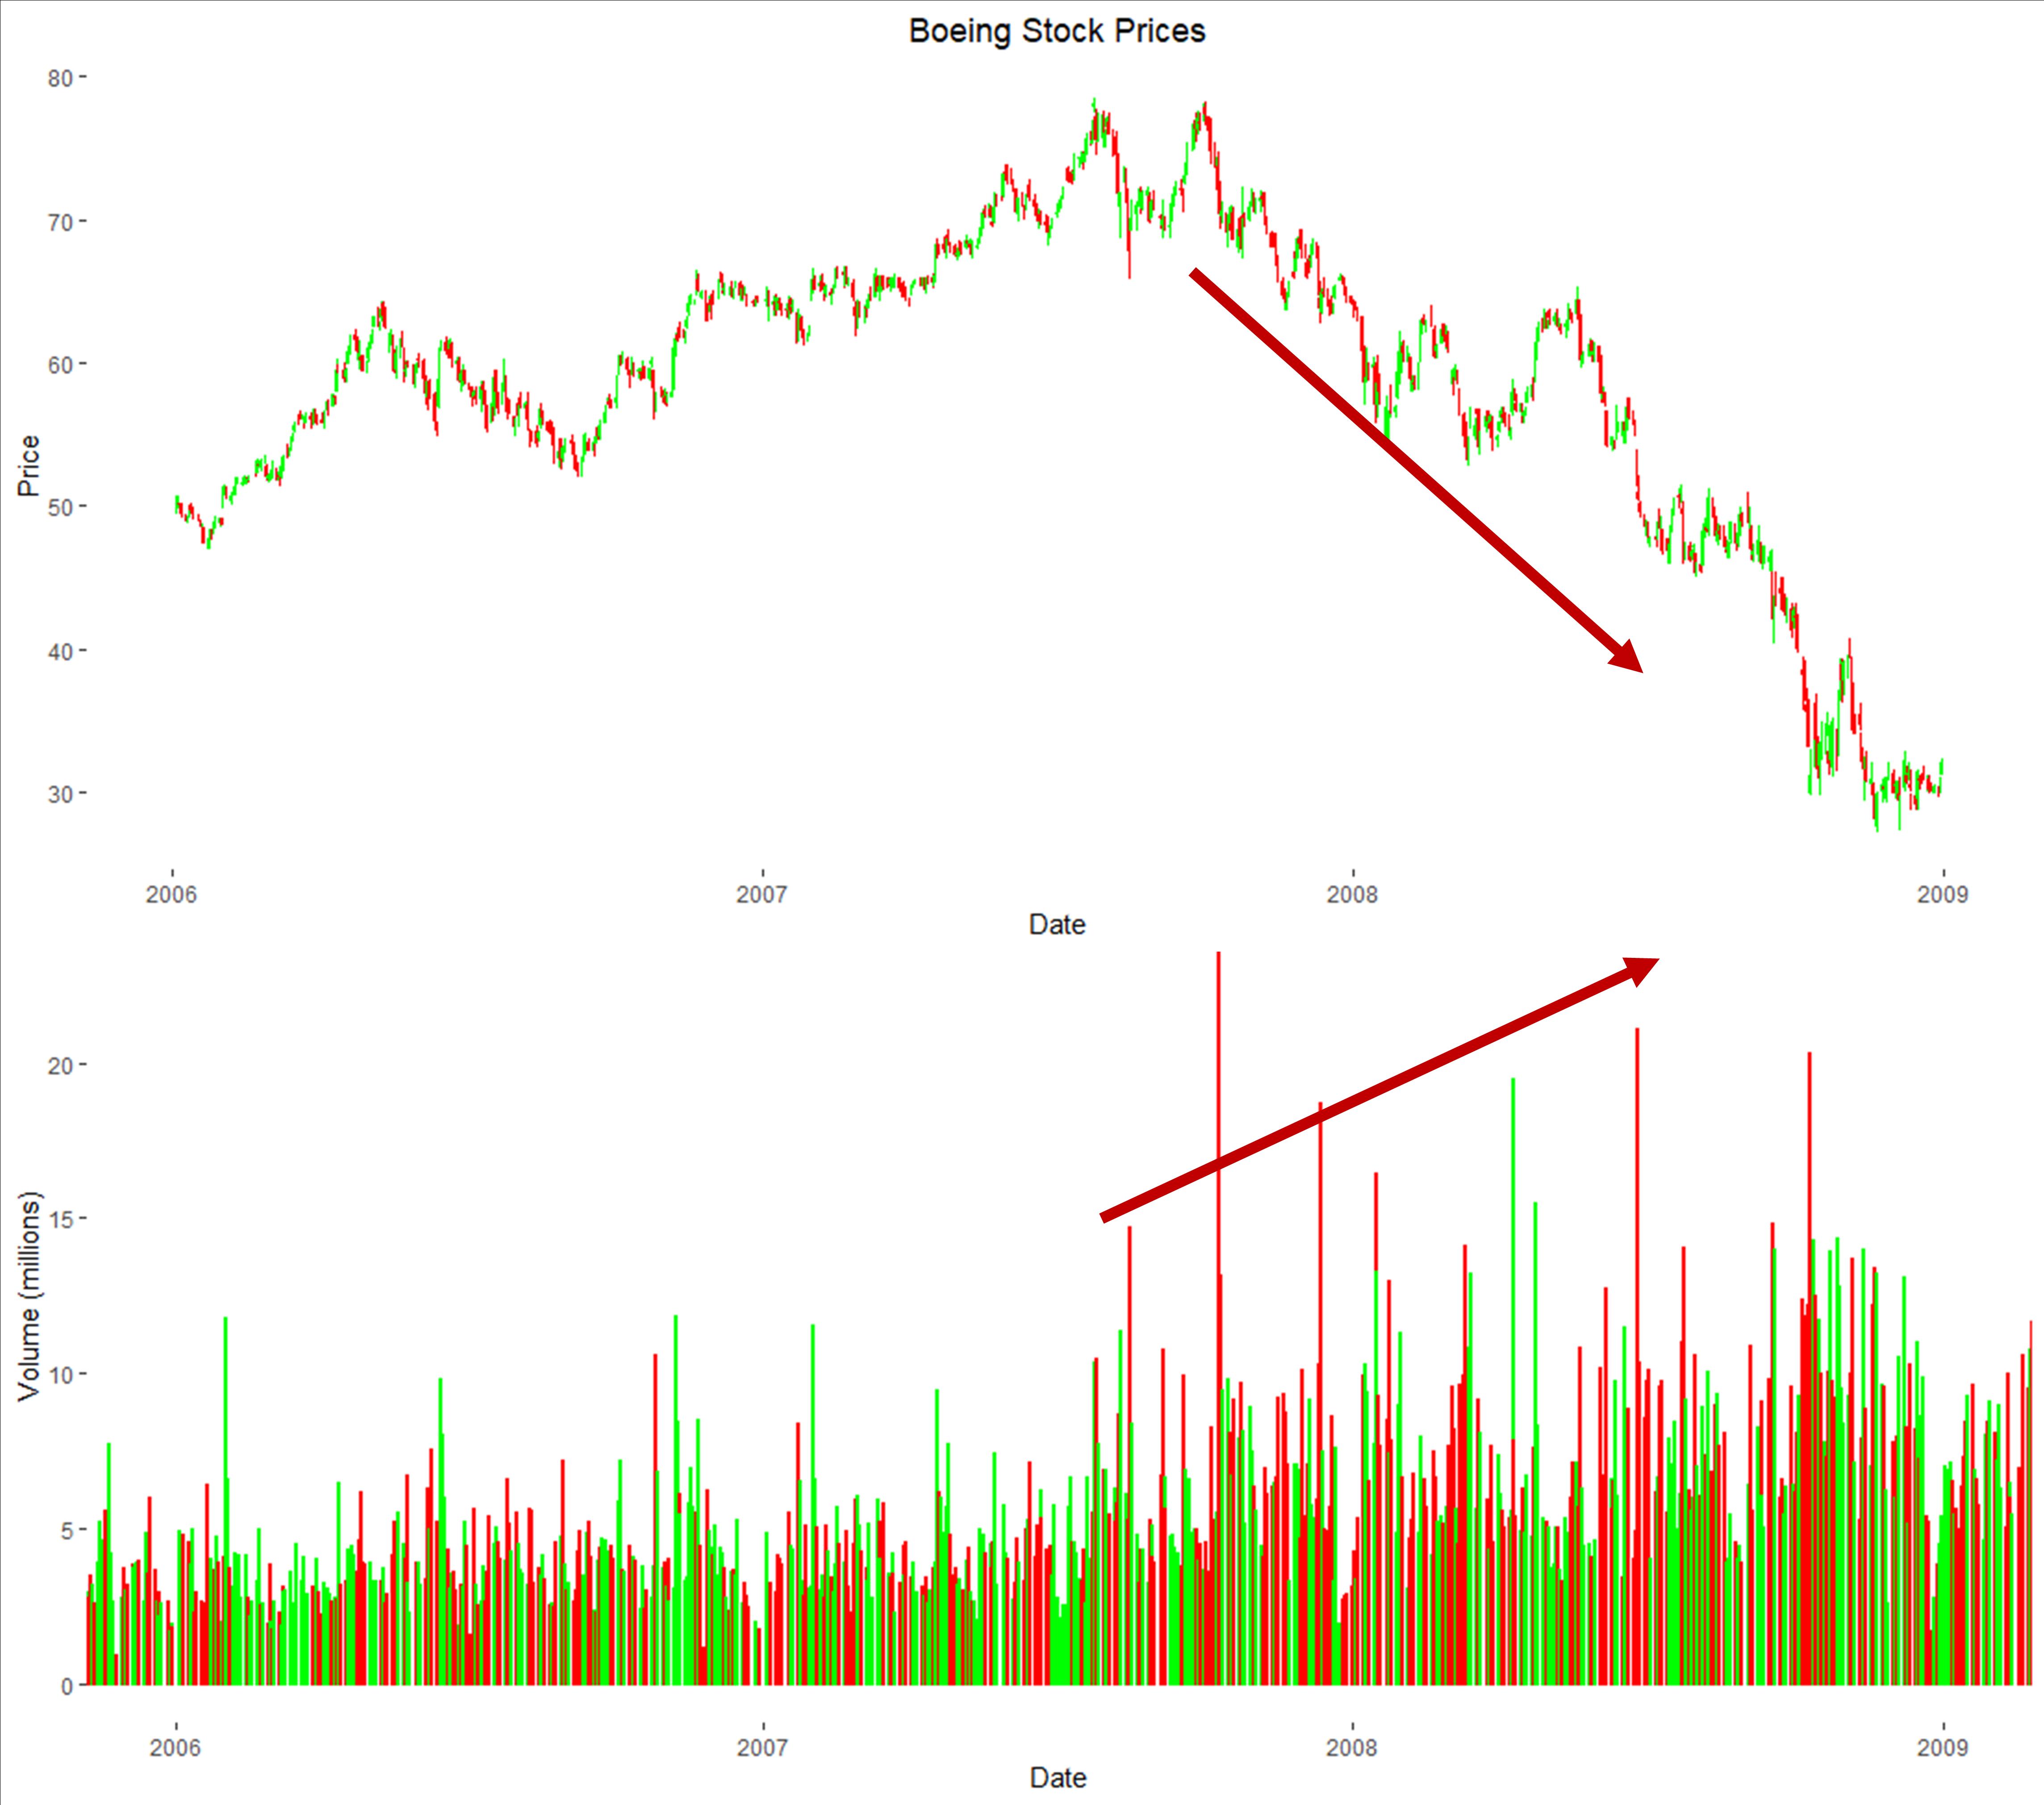 Boeing Price & Volume Trends